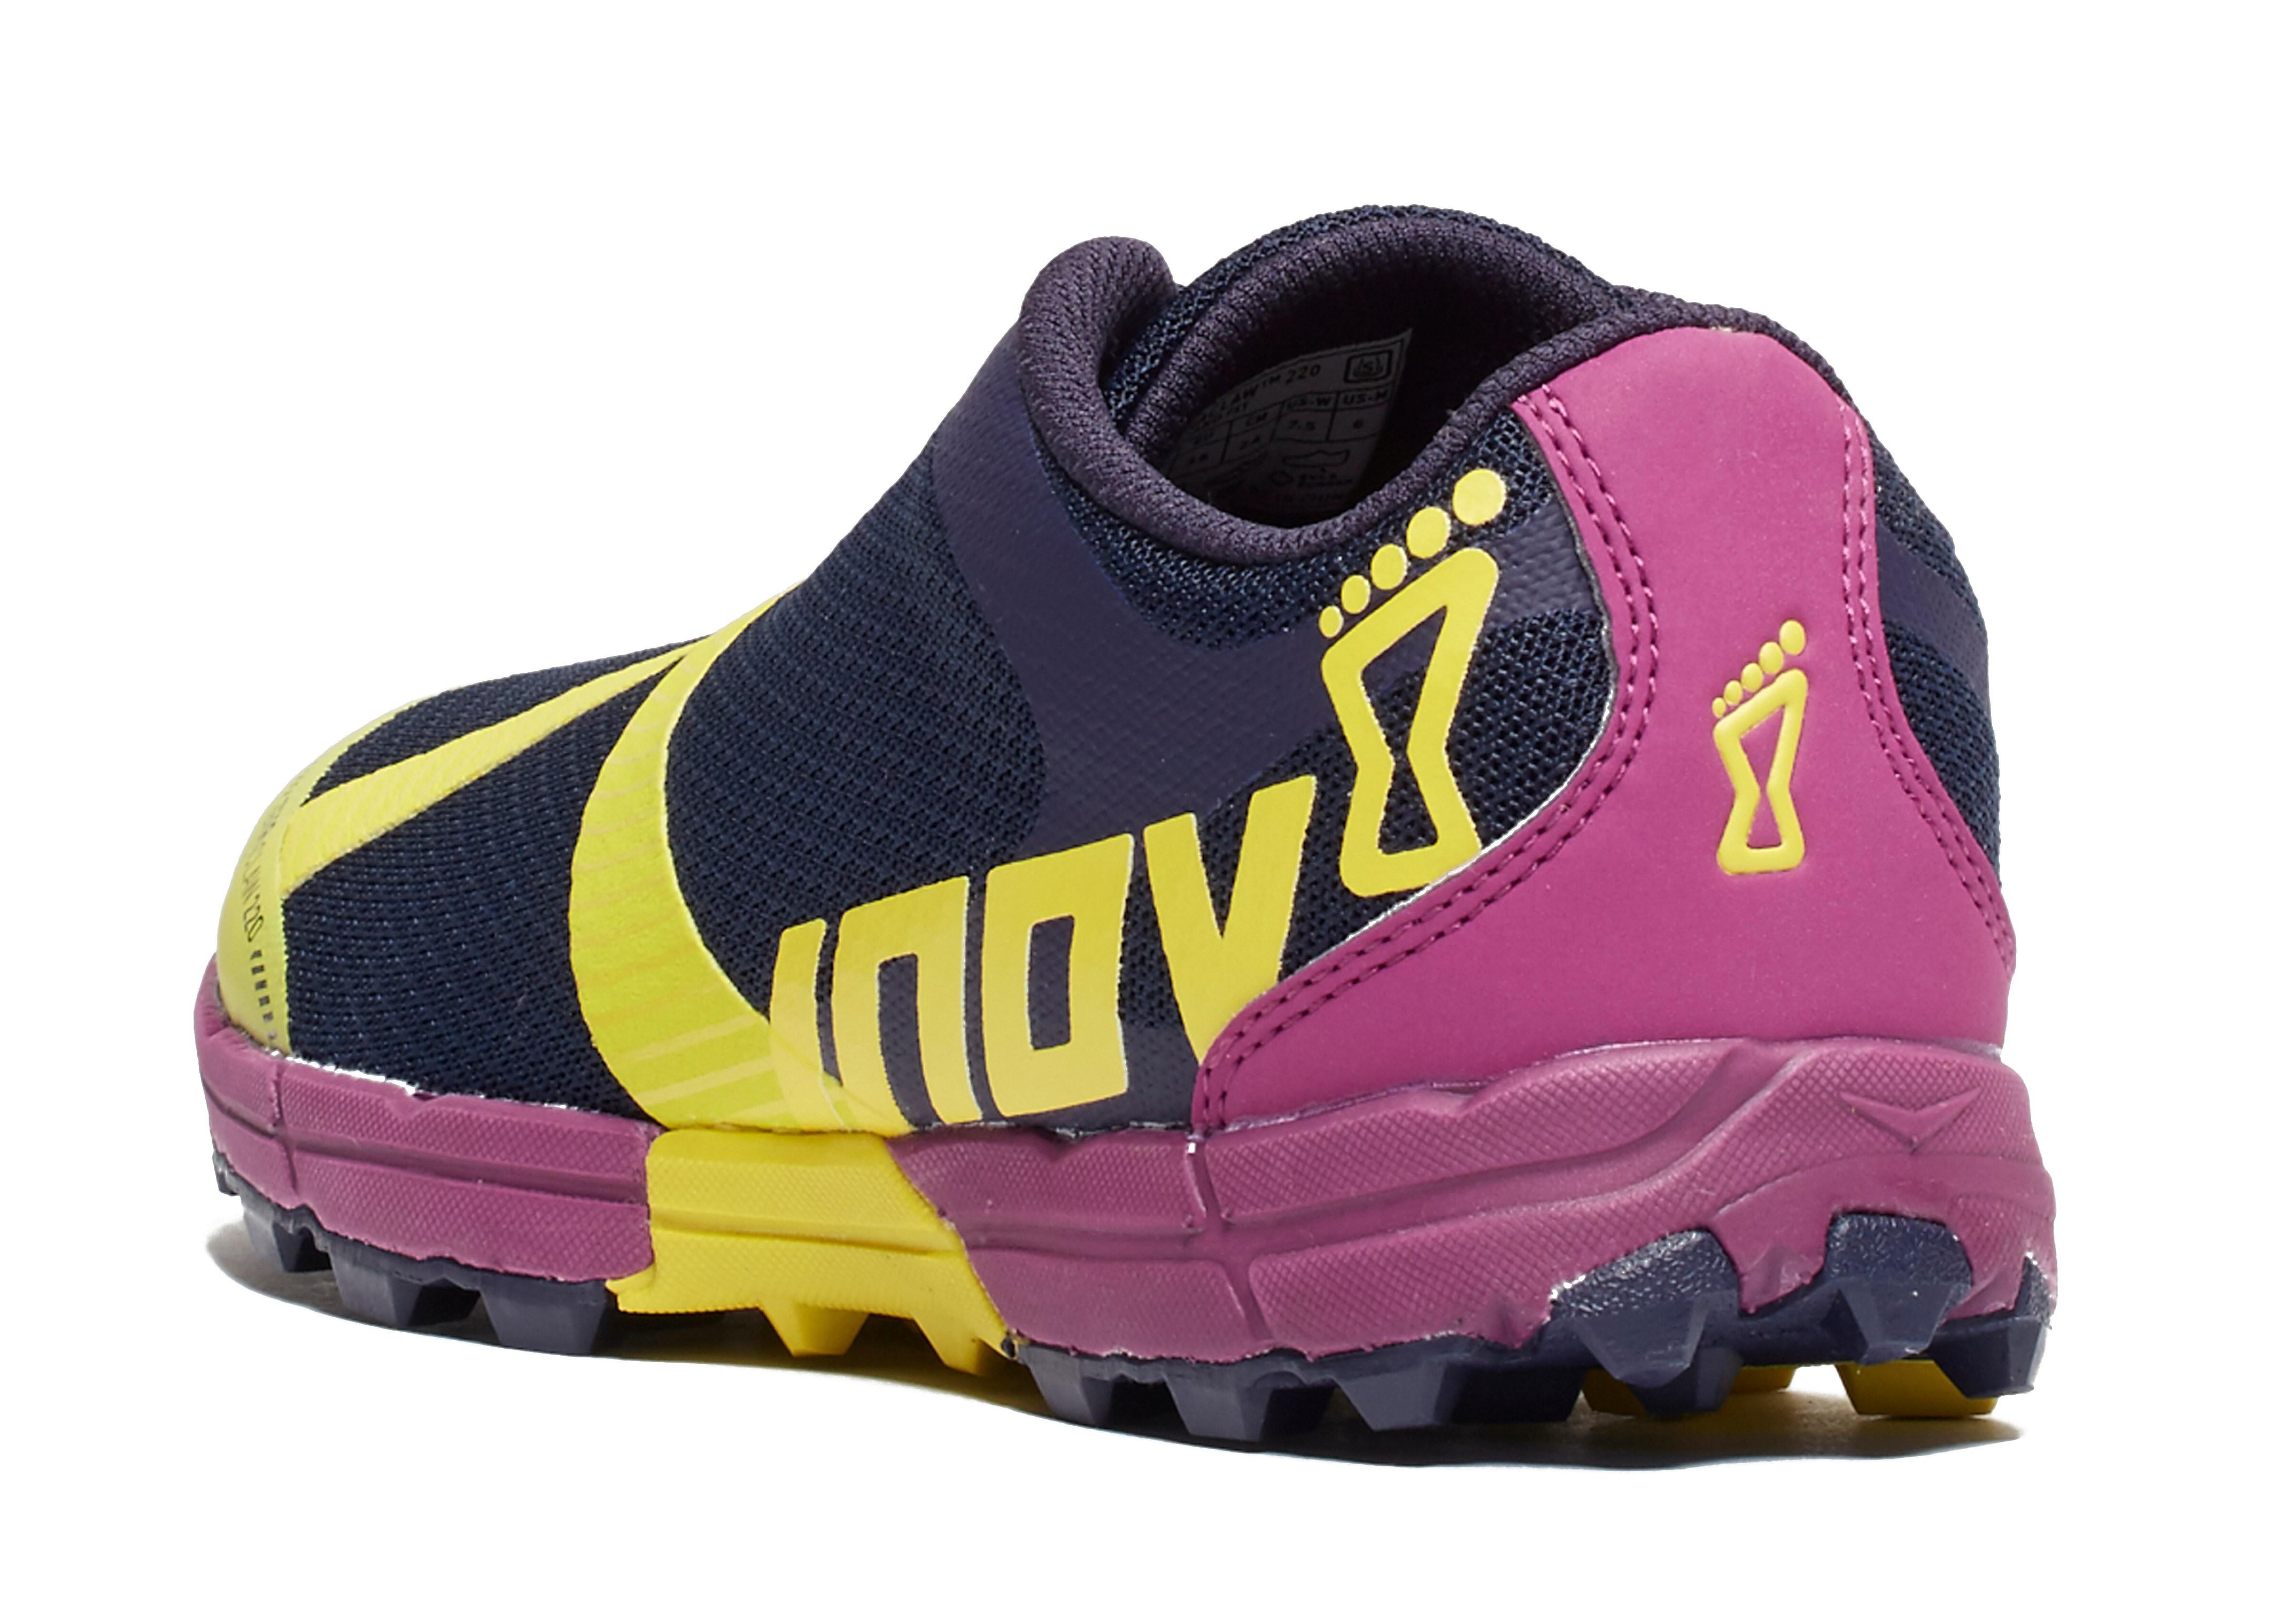 Inov-8 TERRACLAW 220 Women's Running Shoes